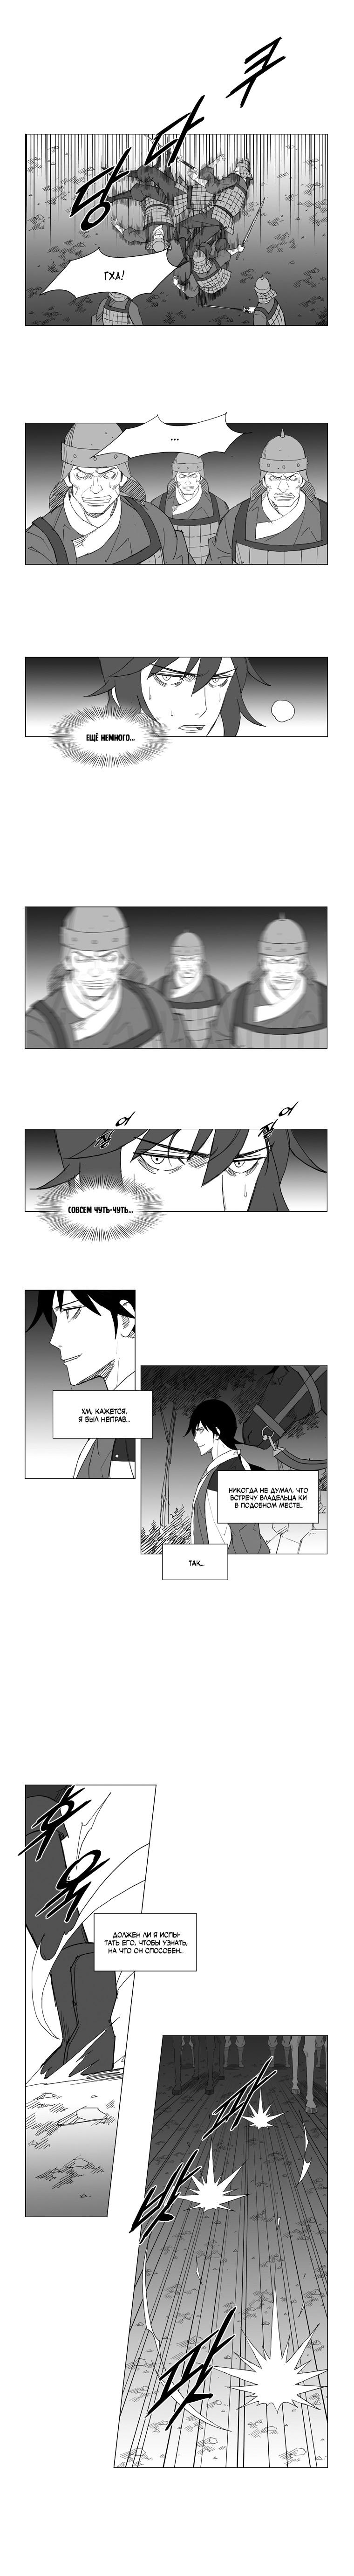 https://r1.ninemanga.com/comics/pic2/39/28263/317432/148571671966.jpg Page 4